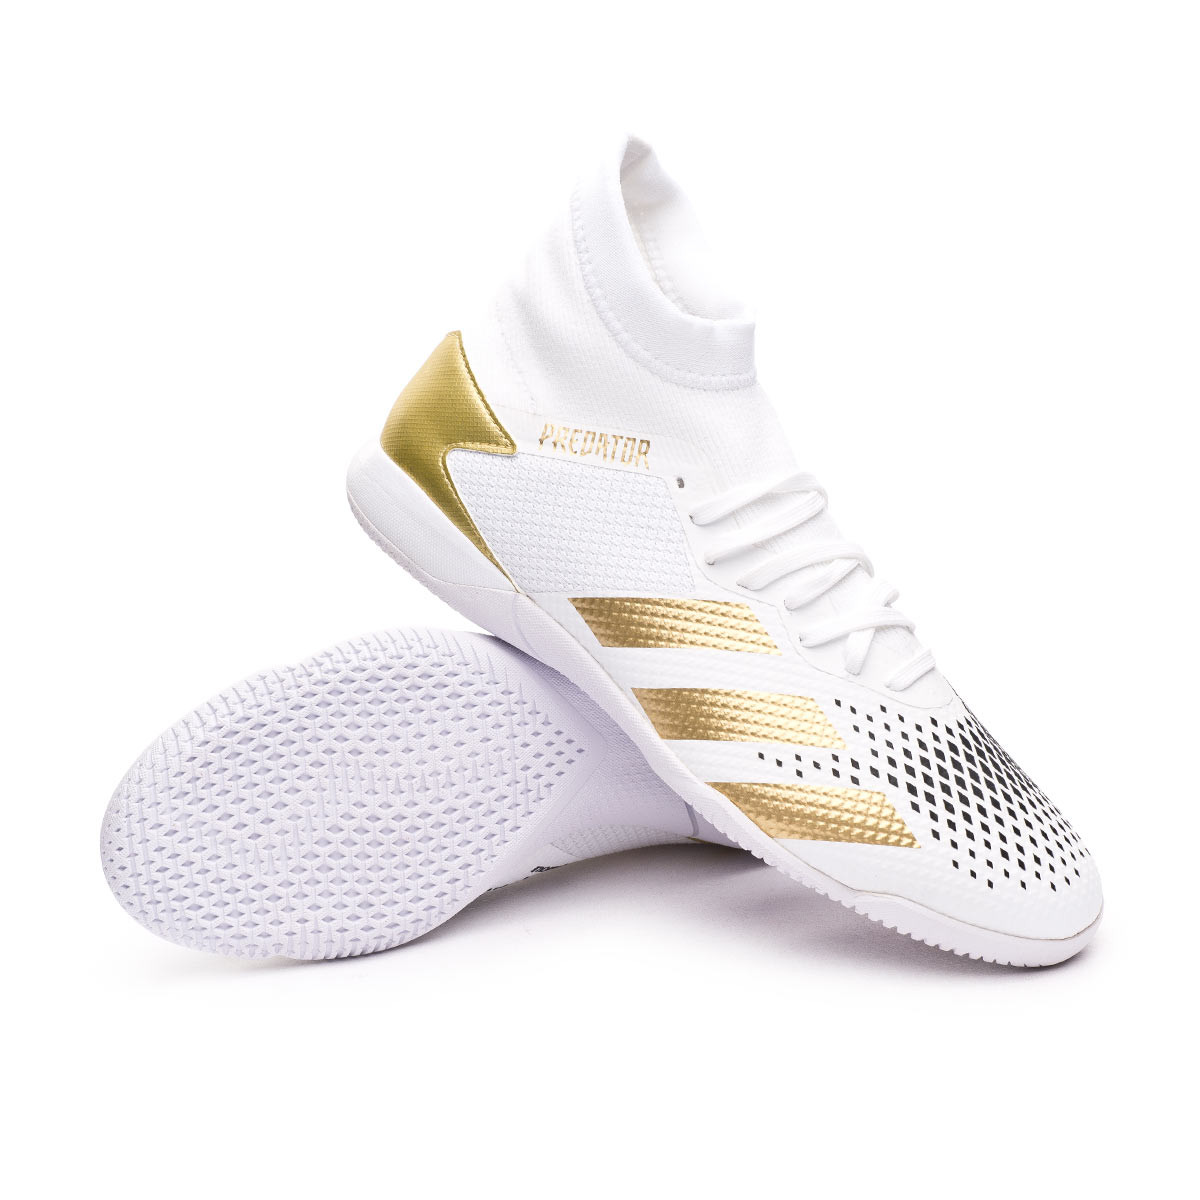 Chaussure de futsal adidas Predator 20.3 IN White-Gold metallic ...